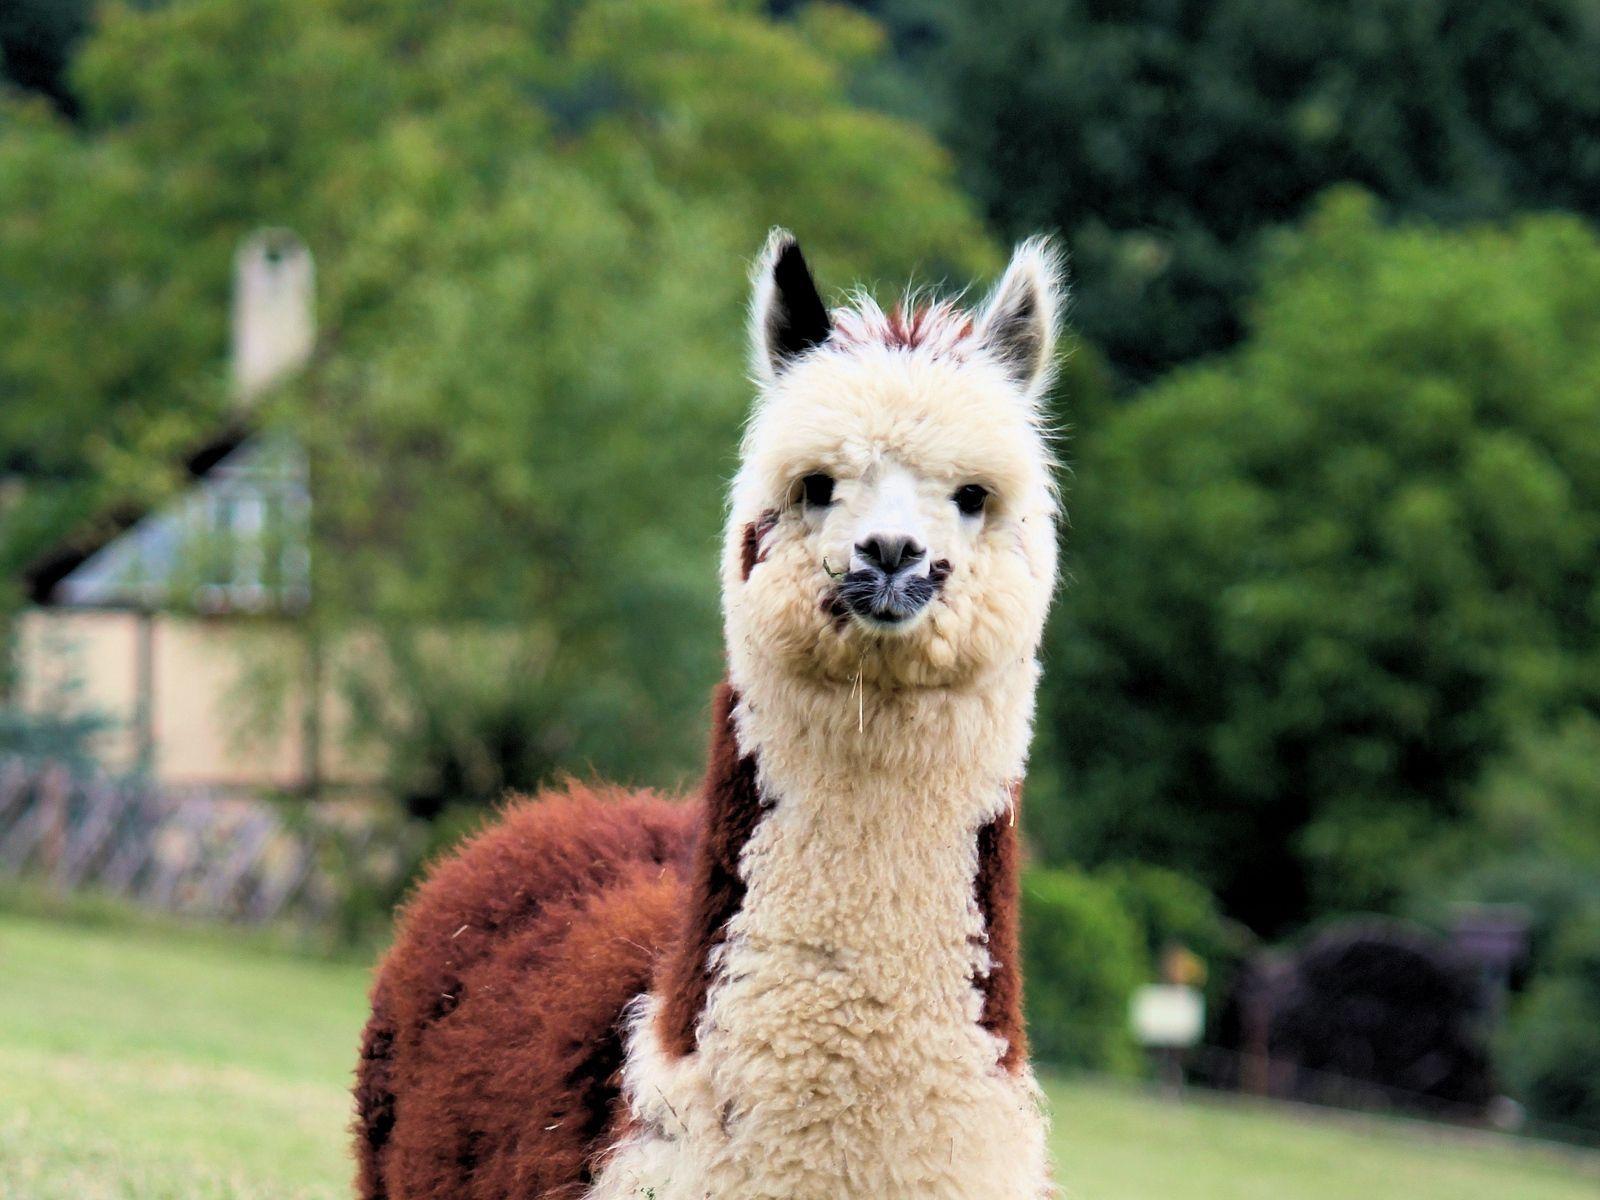 Funny Llama Wallpapers Top Free Funny Llama Backgrounds Wallpaperaccess